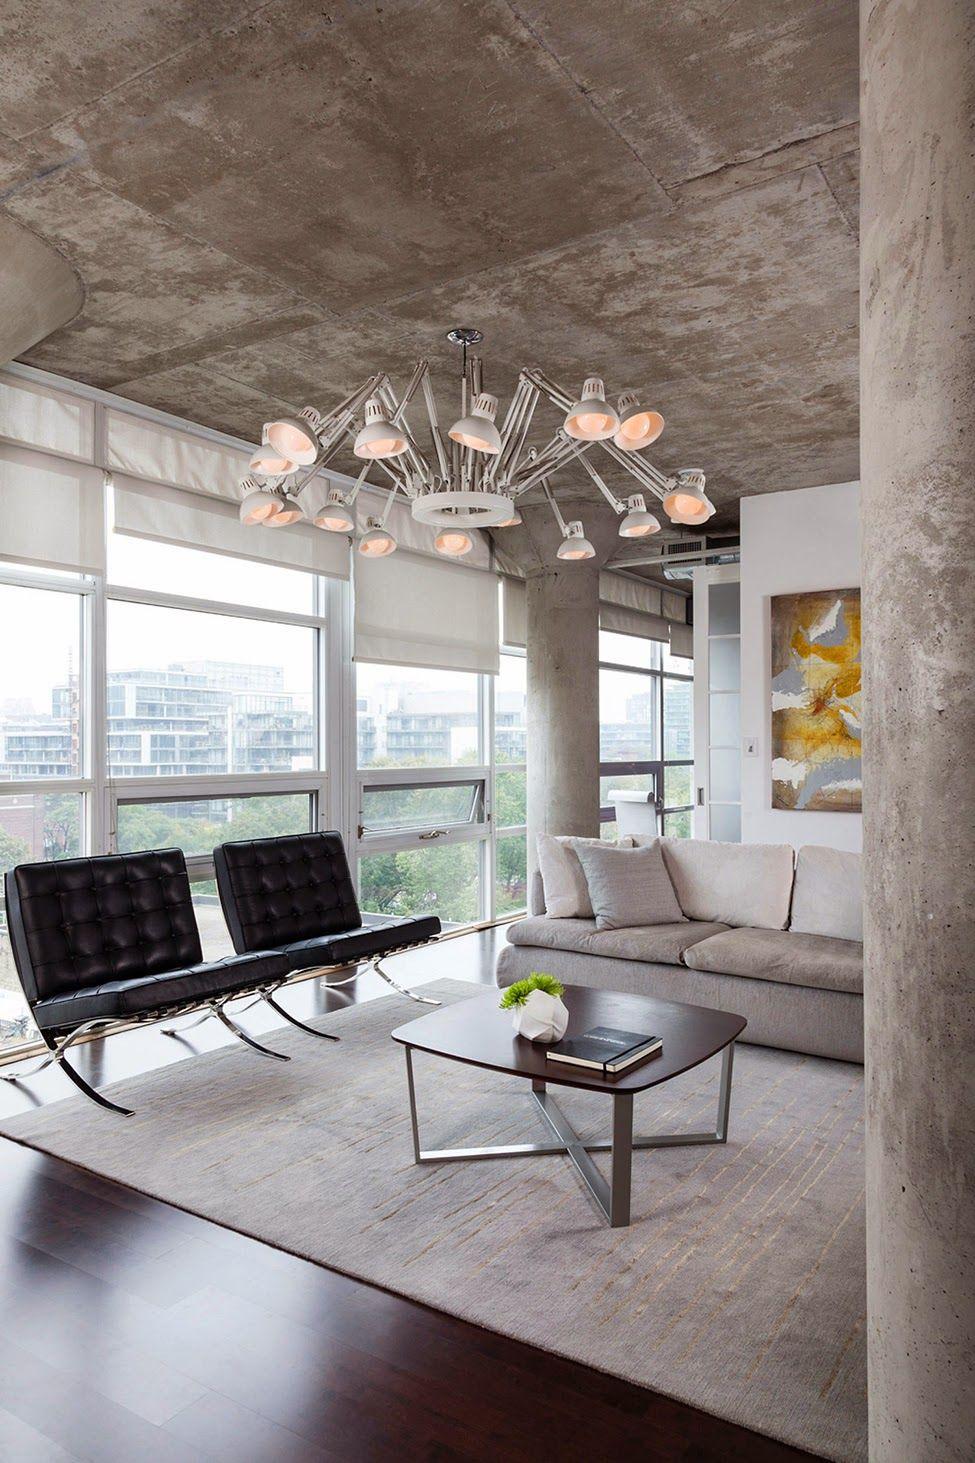 Planos low cost queremos la silla barcelona interior for Casa minimalista barcelona capital